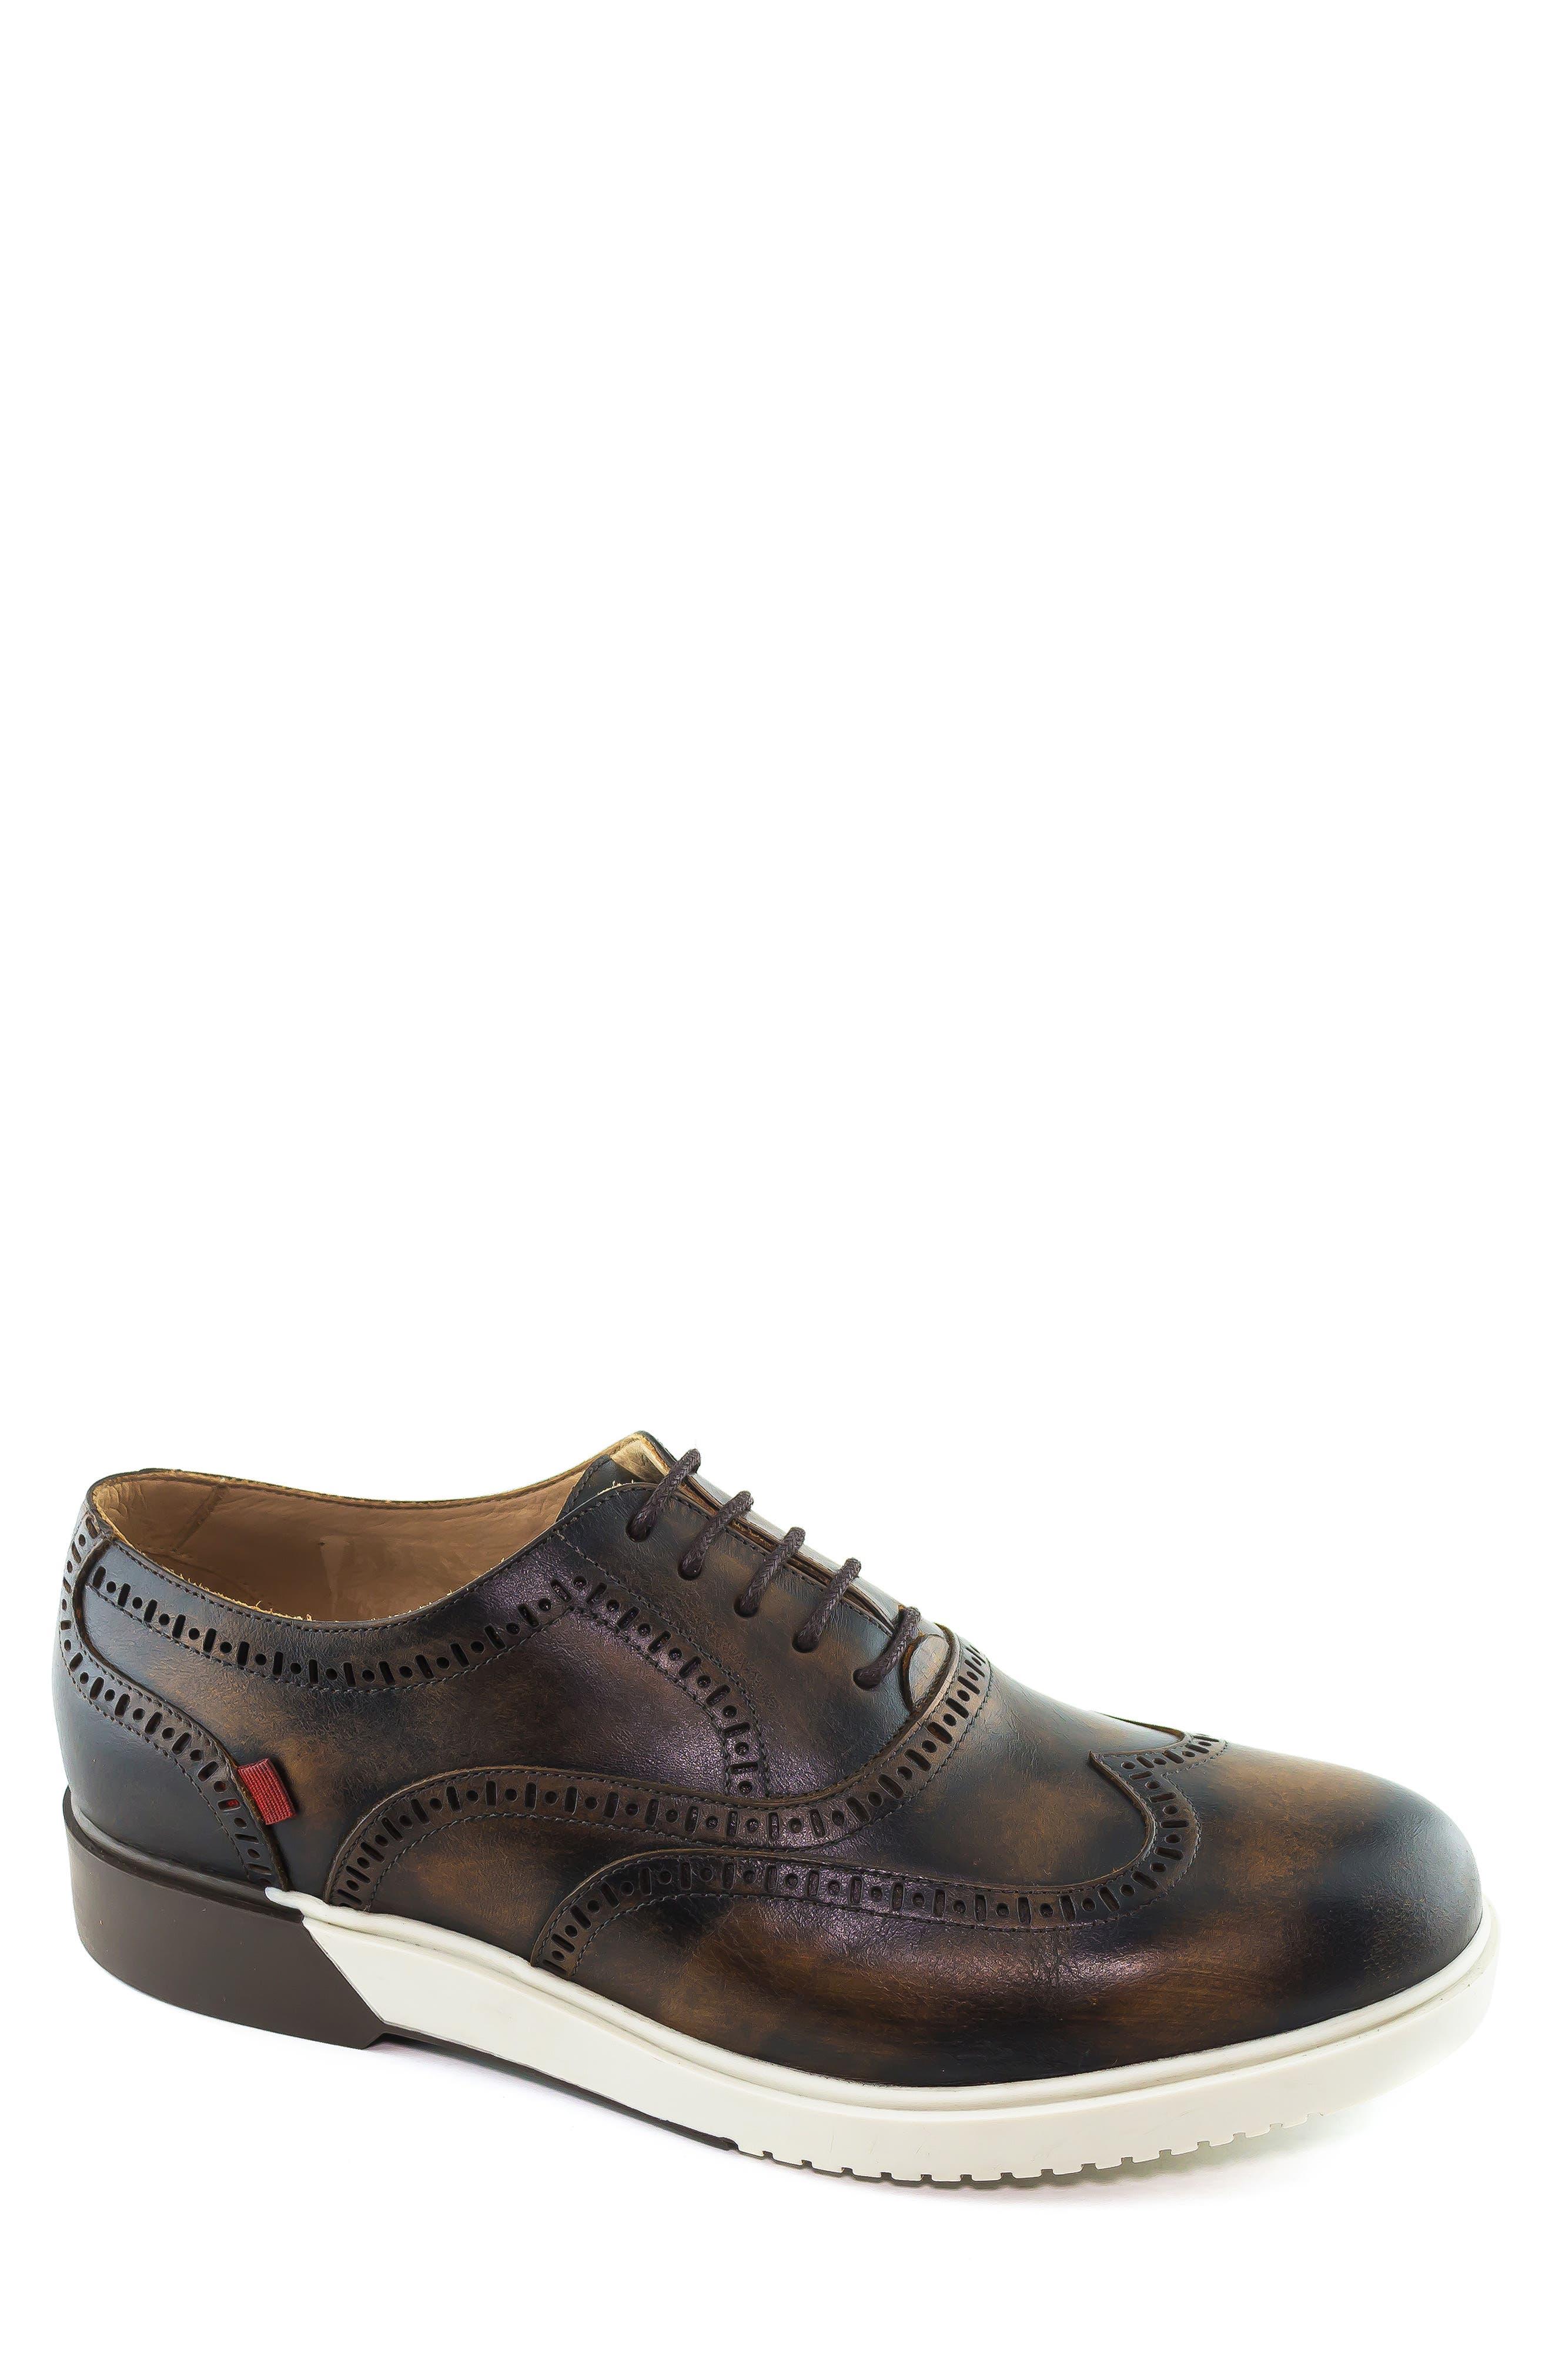 Marc Joseph New York 5Th Ave Wingtip Sneaker, Brown